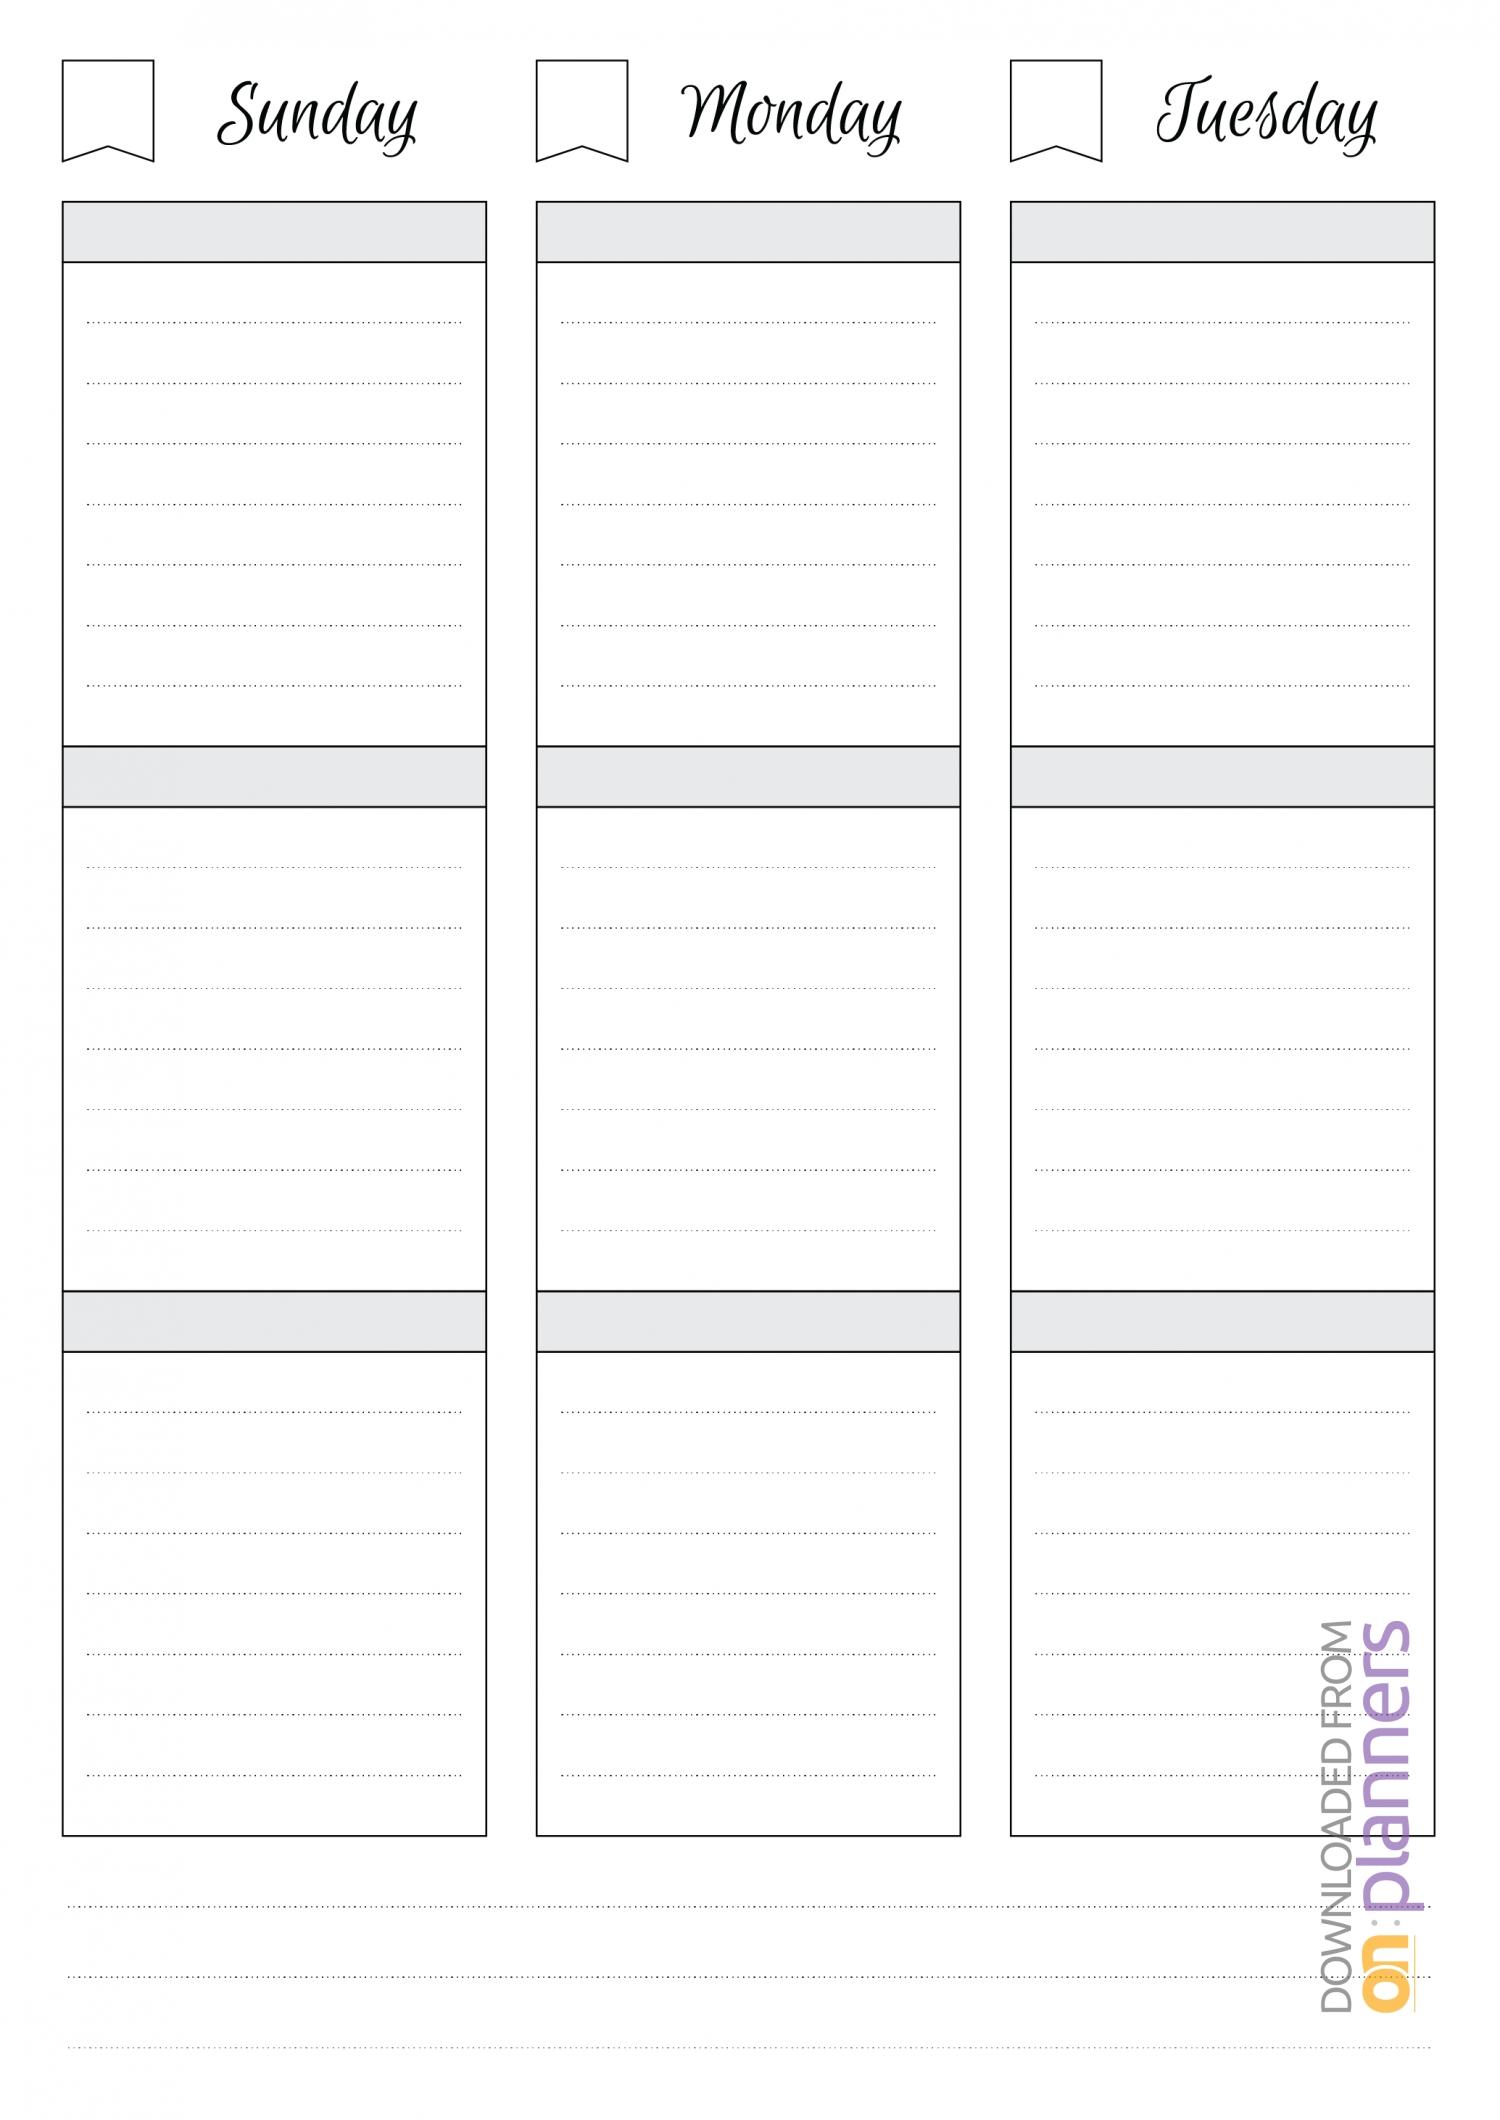 Printable Blank Weekly Calendars Templates | Free Calendar Template Example with Free Weekly Planner Template